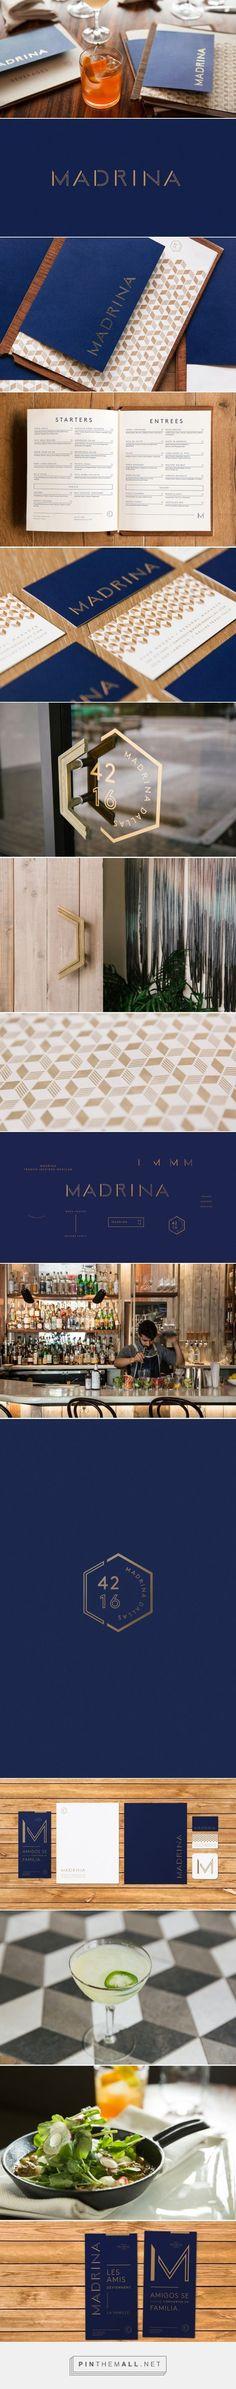 10 Amazing Restaurant Brand Identity Designs